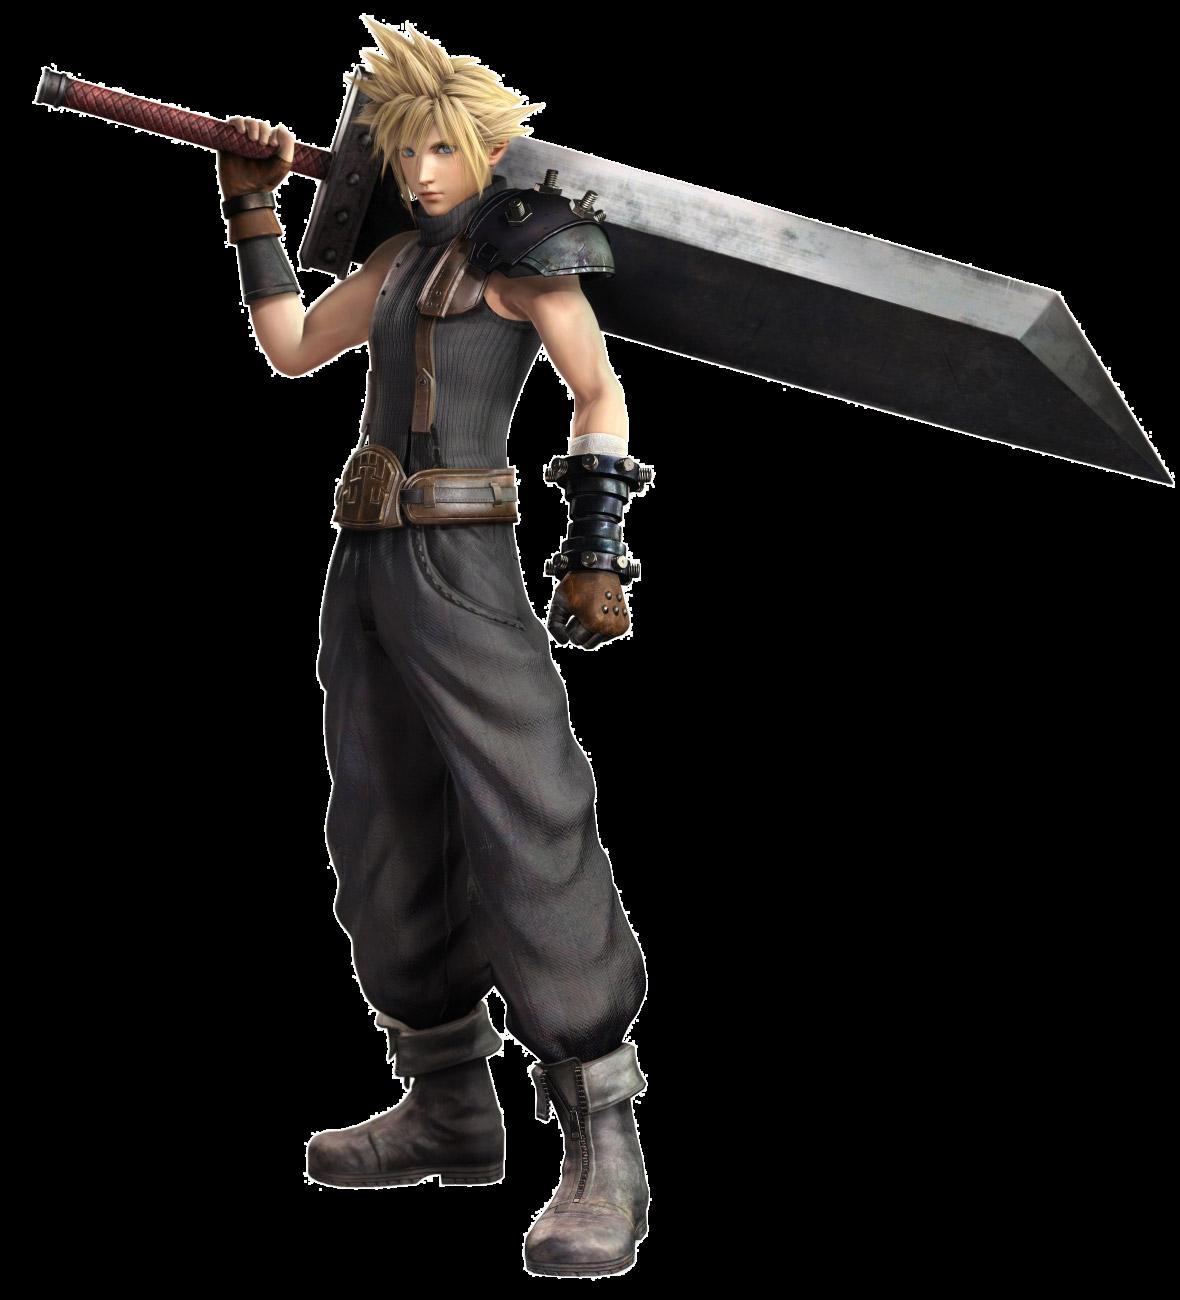 Dissidia Final Fantasy (2015) - Special Gameplay Trailer